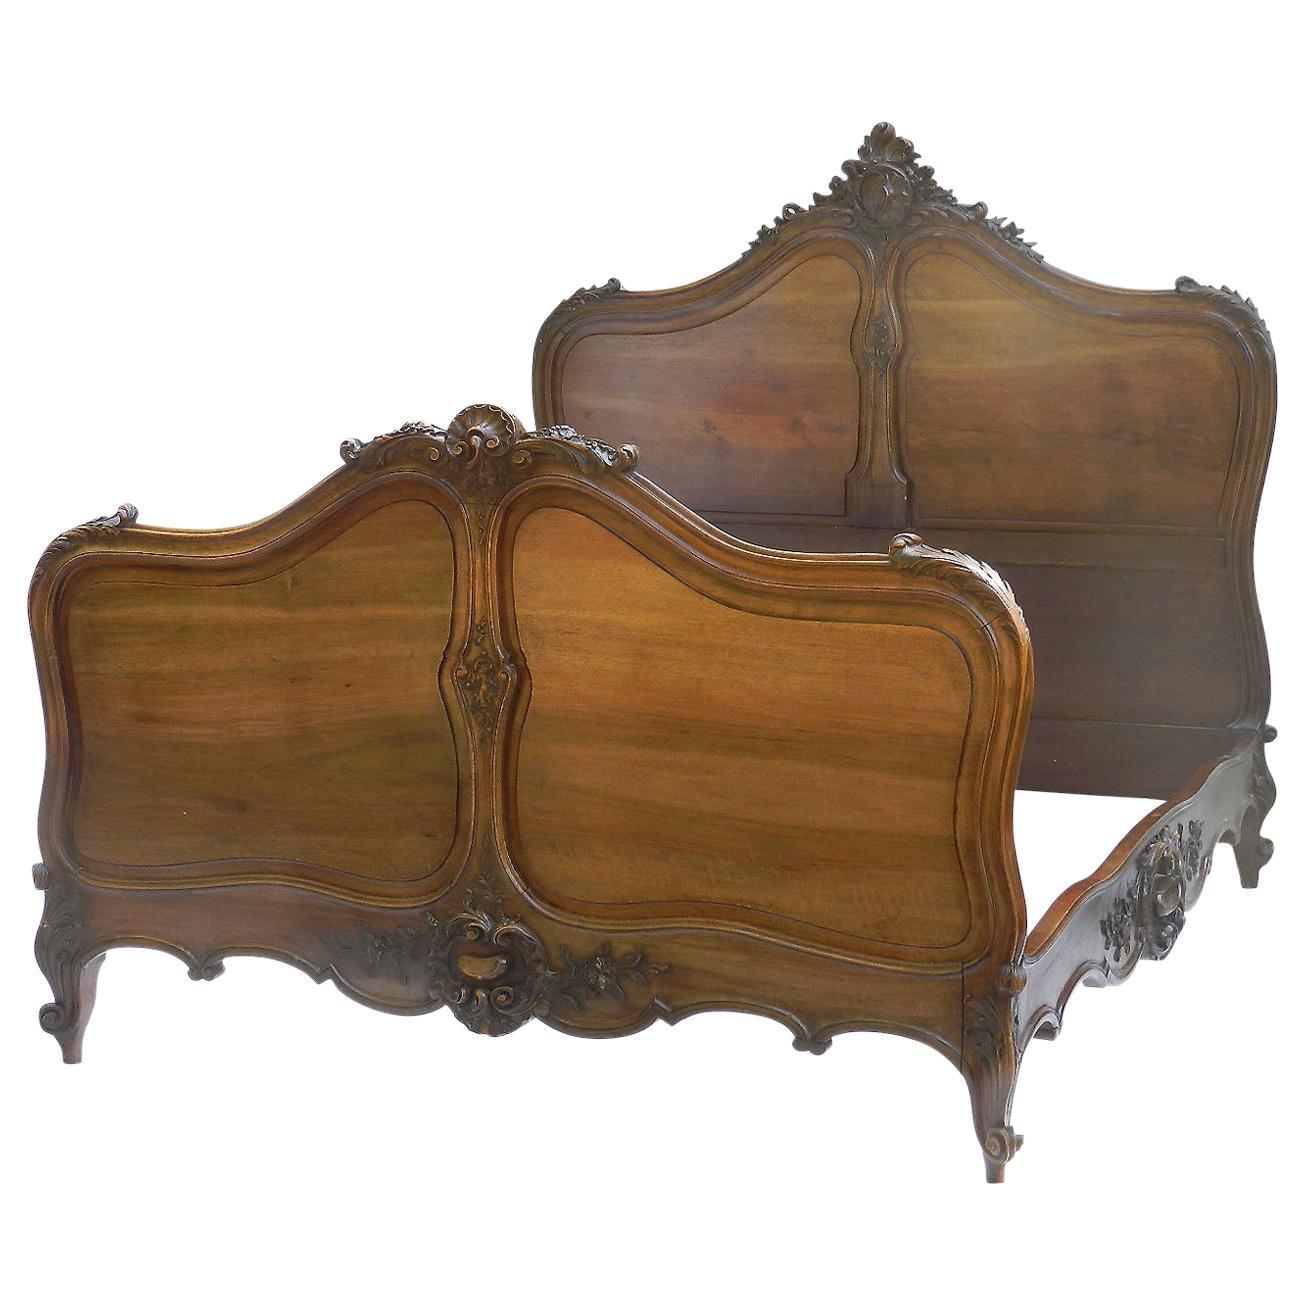 Pleasant Louis Xv Bedroom Furniture 162 For Sale At 1Stdibs Best Image Libraries Sapebelowcountryjoecom